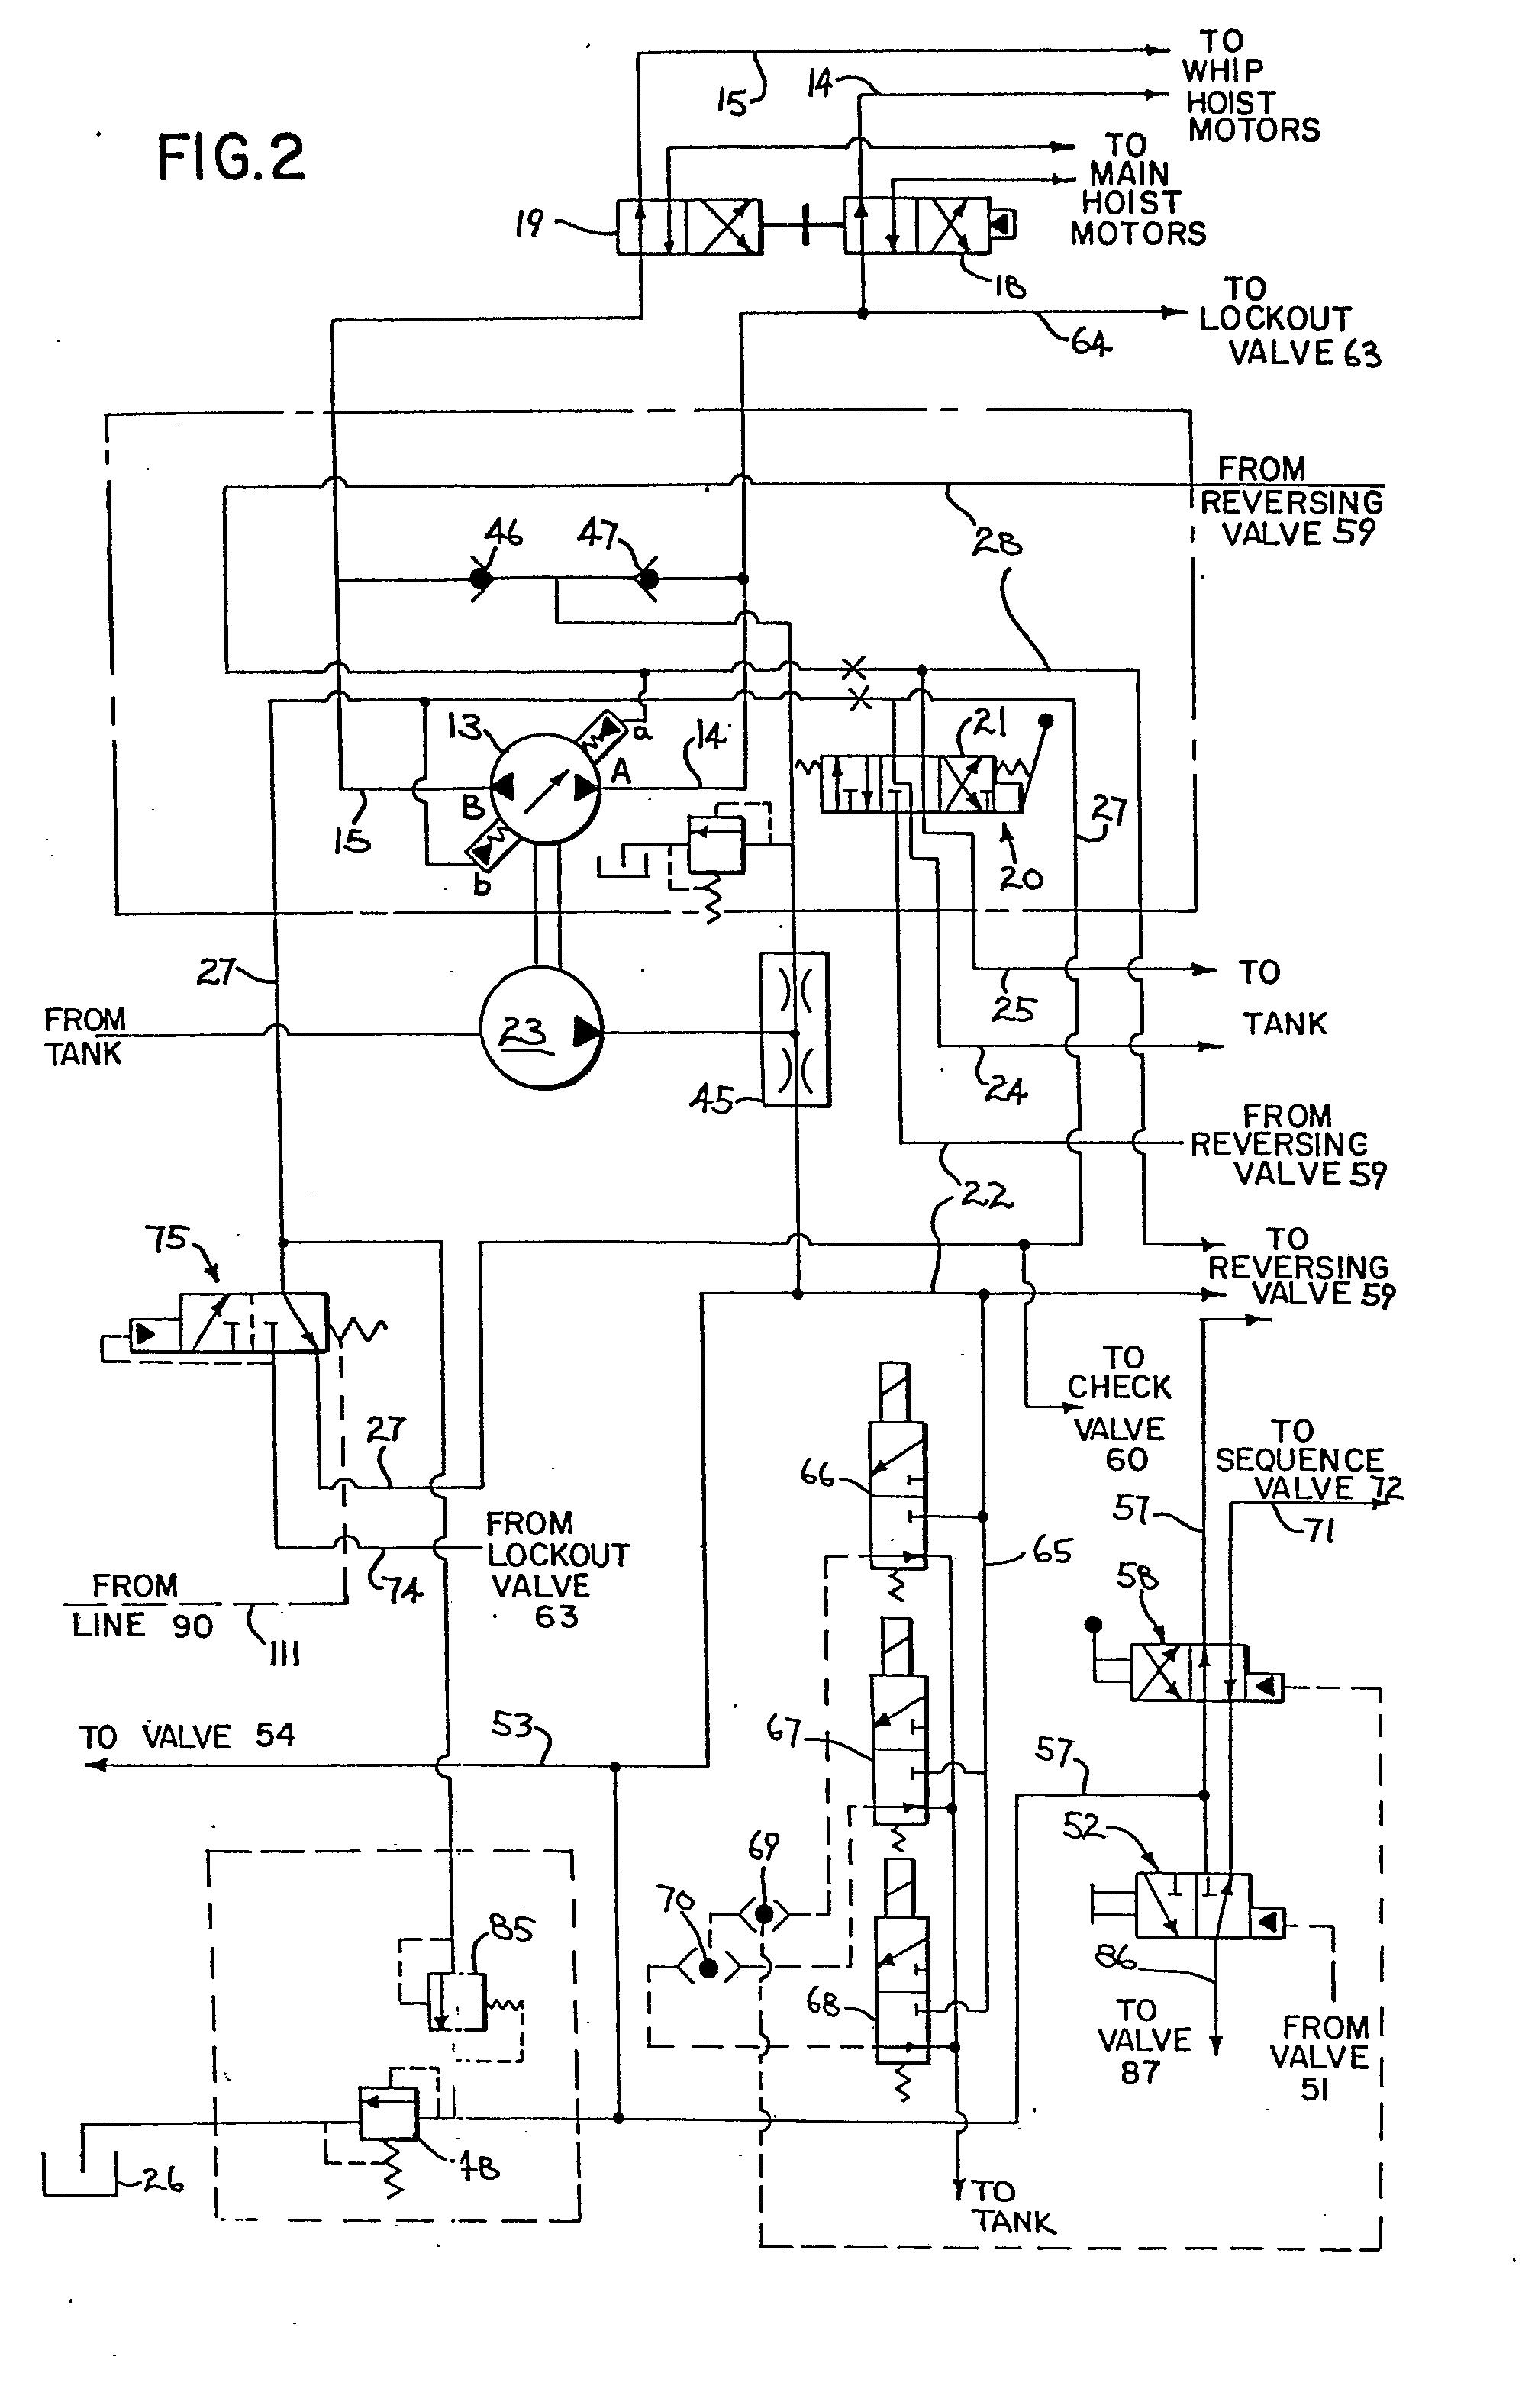 Cm Shopstar Hoist Wiring Diagram Manual Of Dayton And